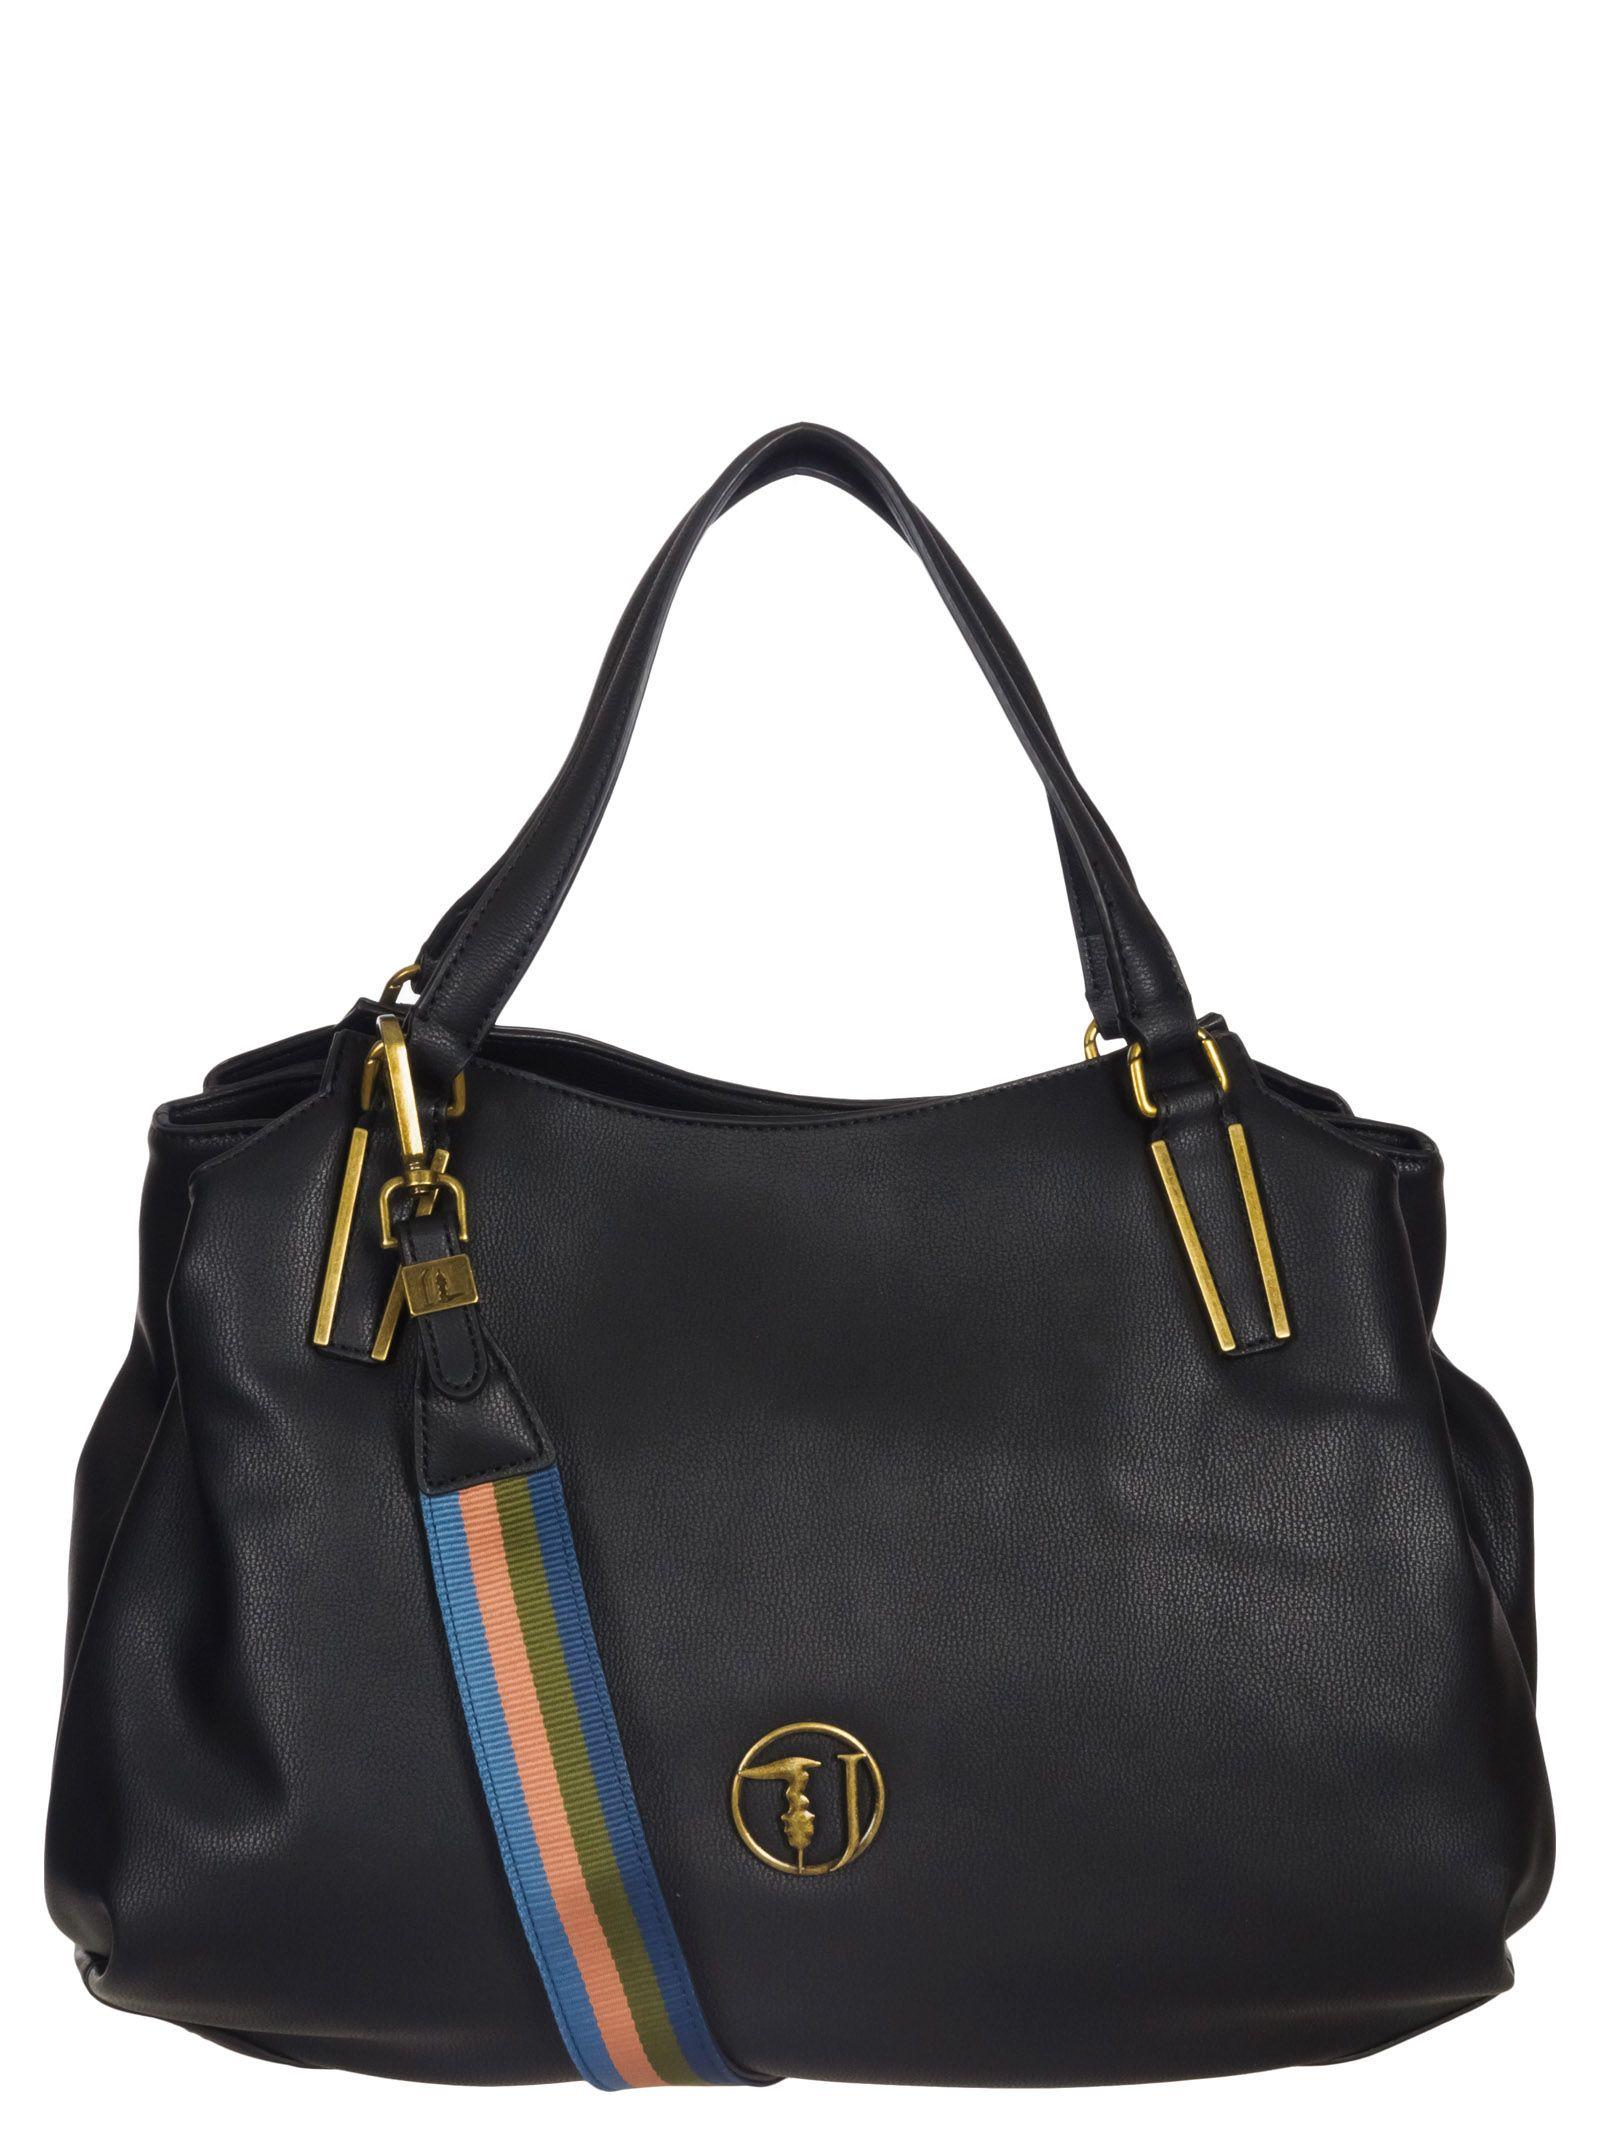 Trussardi Jeans Trussardi Jeans Rabarbaro Medium Tote Bag - Black ... f113a36cabf17